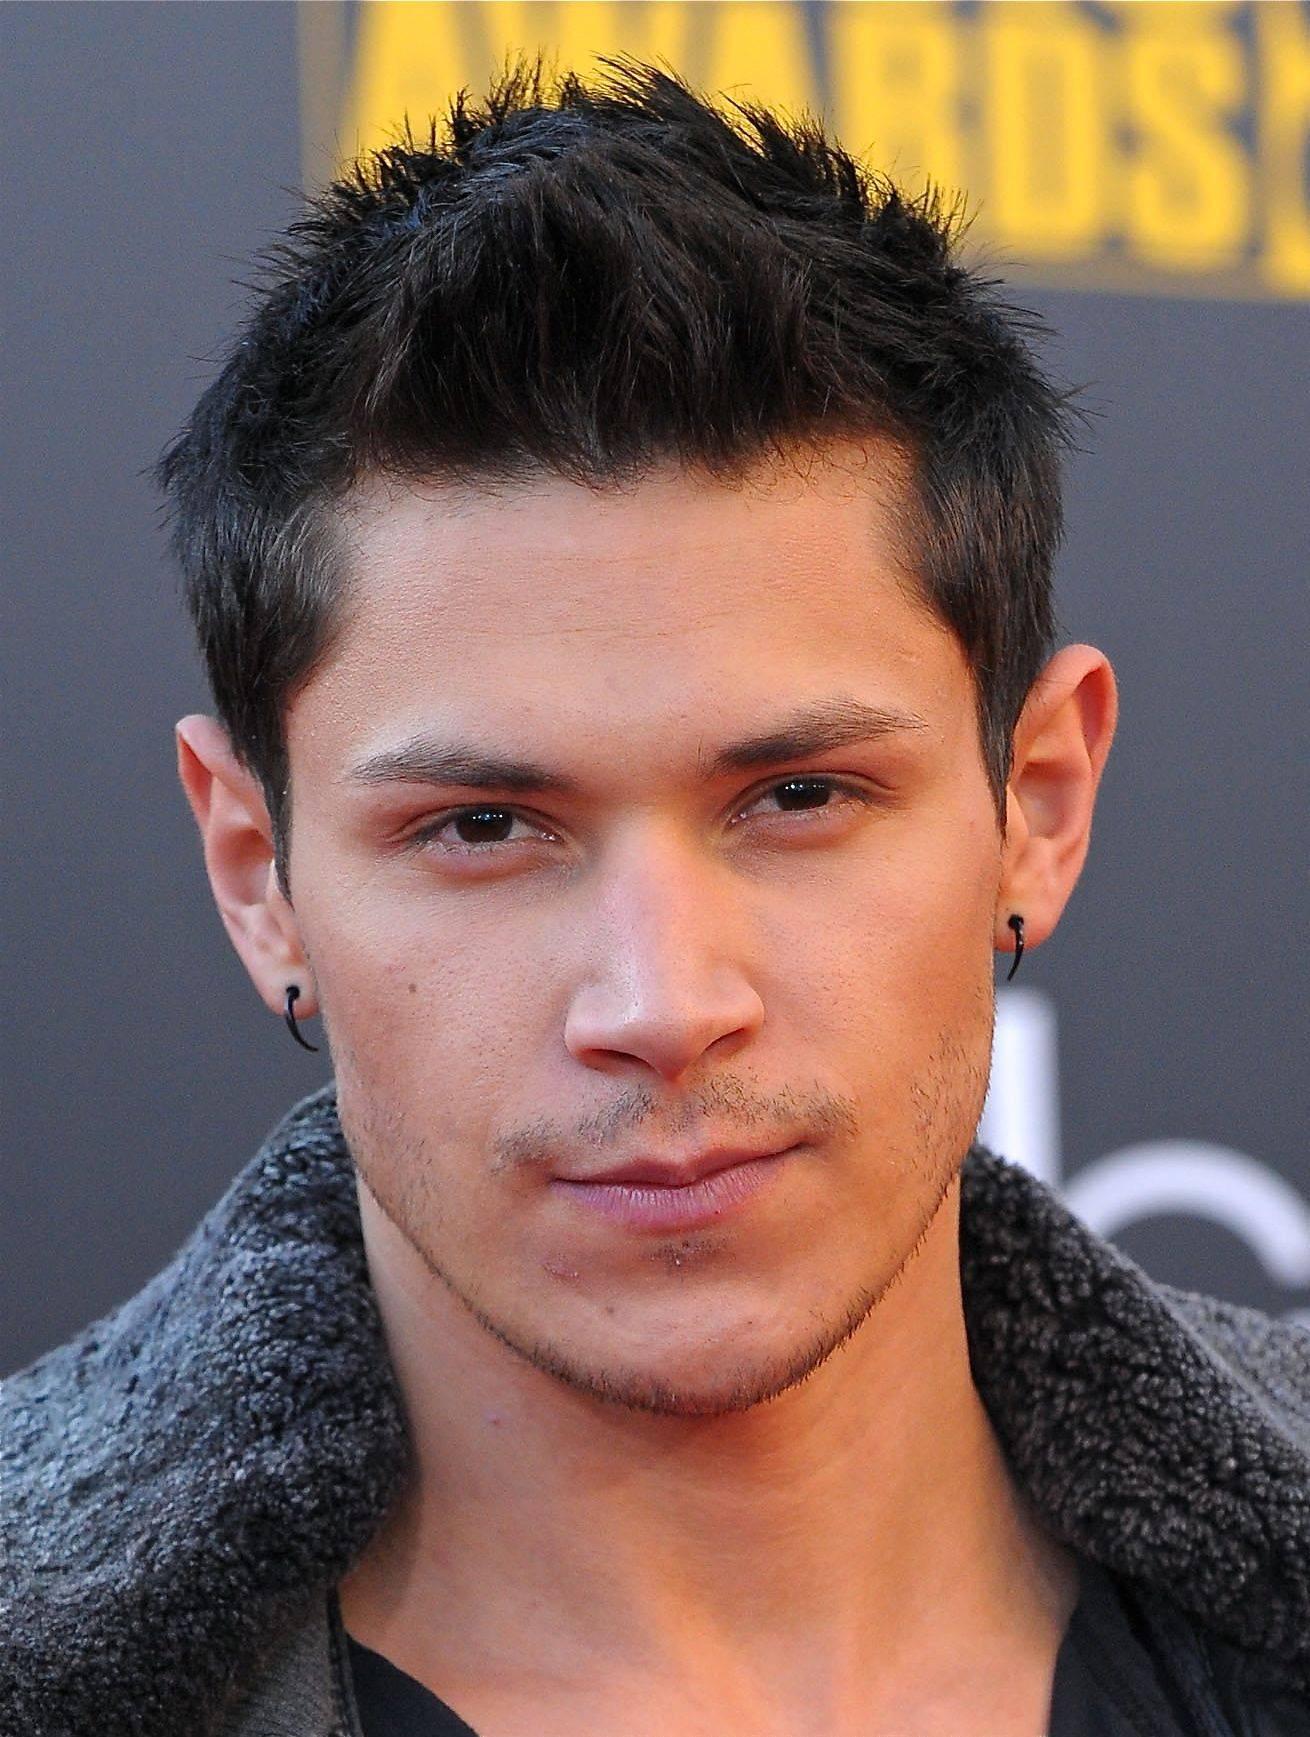 Men's hairstyles 2013, the best - LosHairos.com